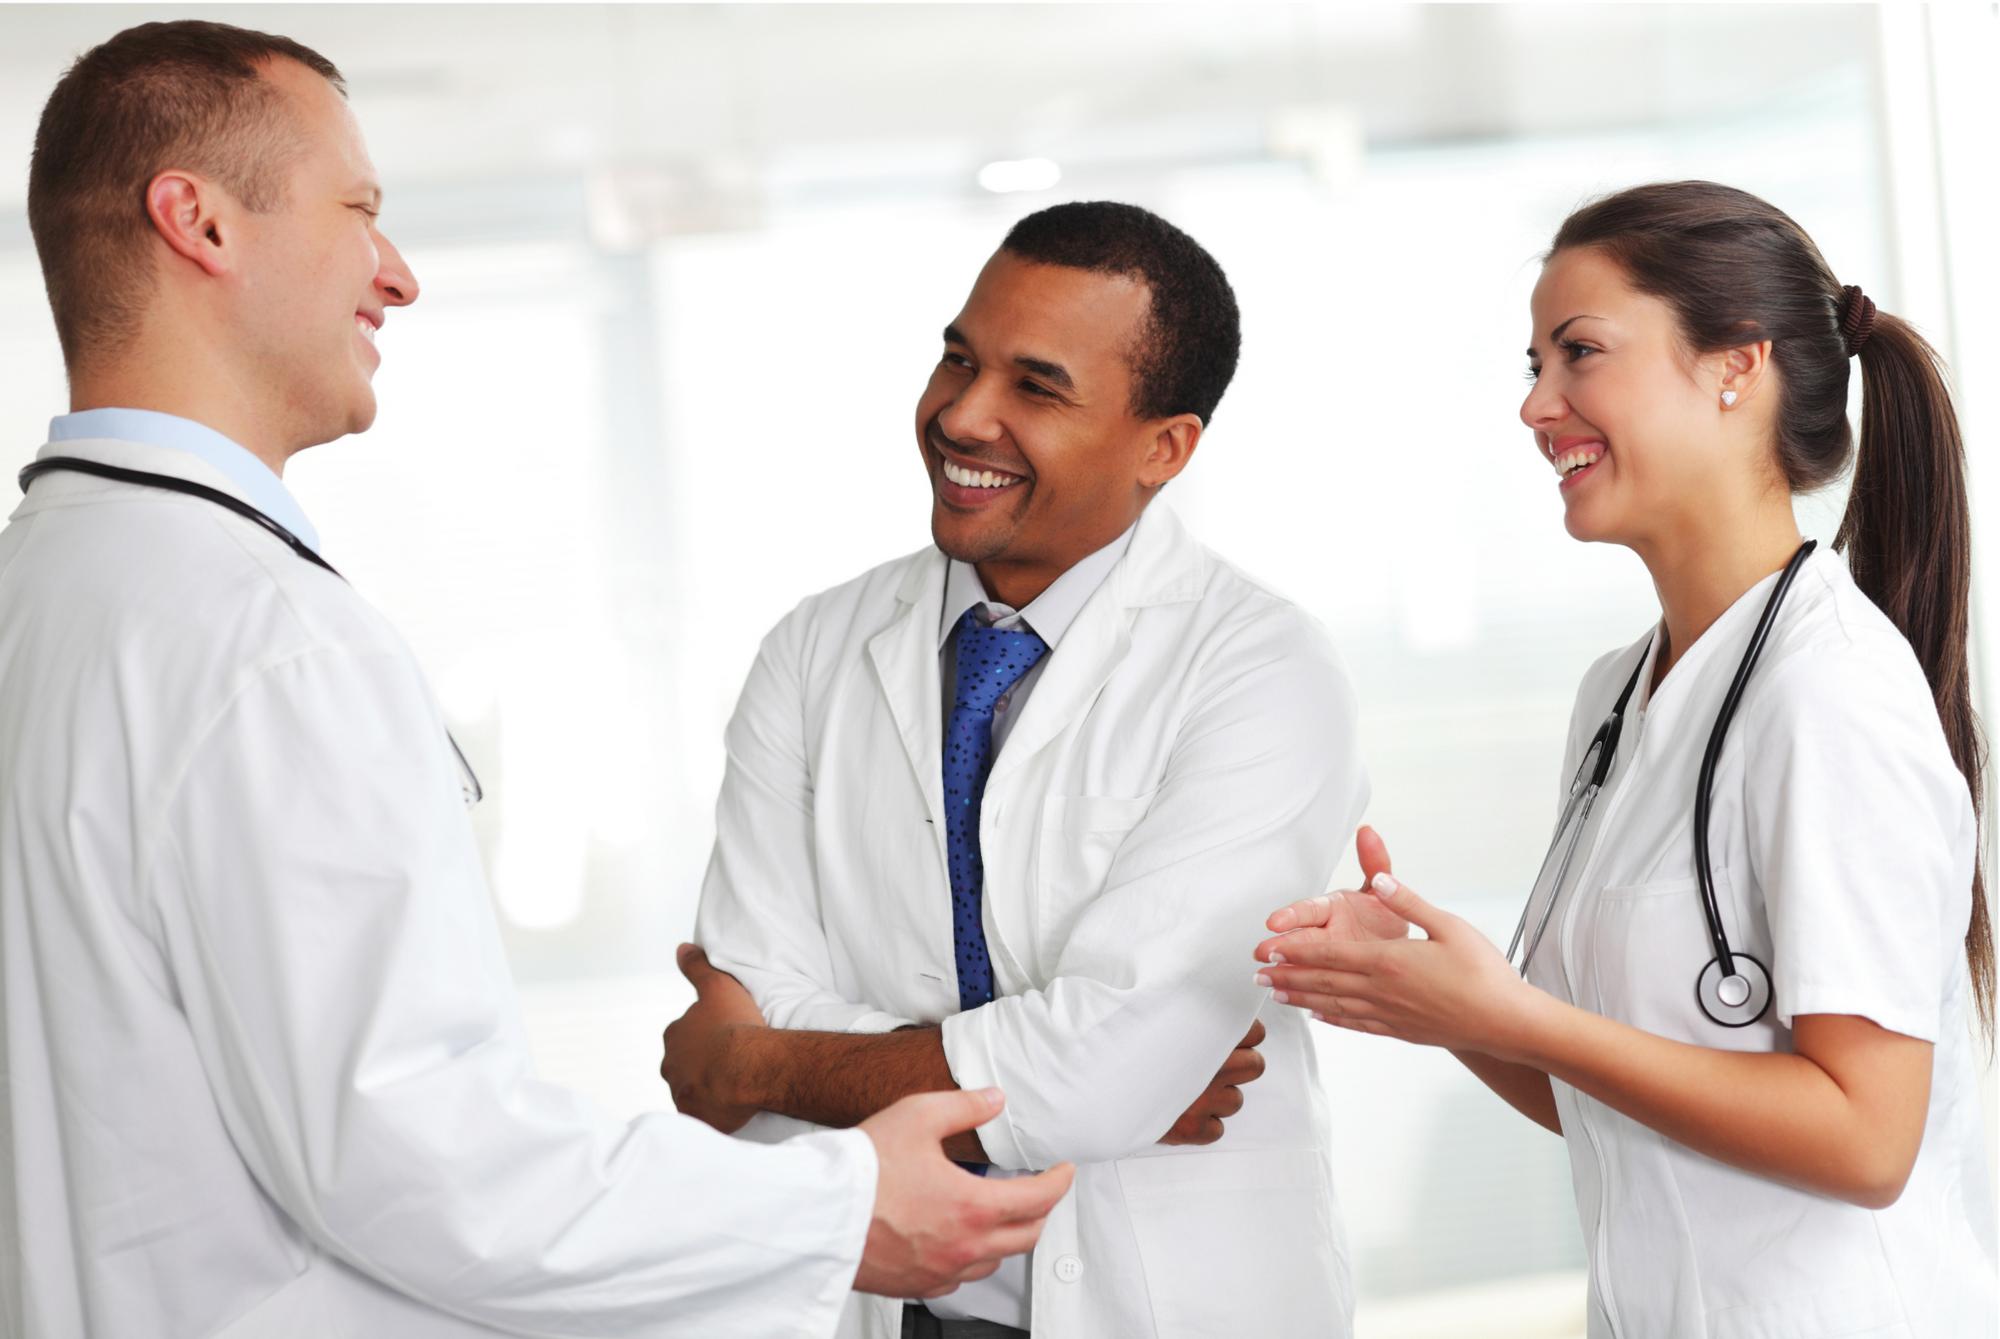 medical professionals collaboration